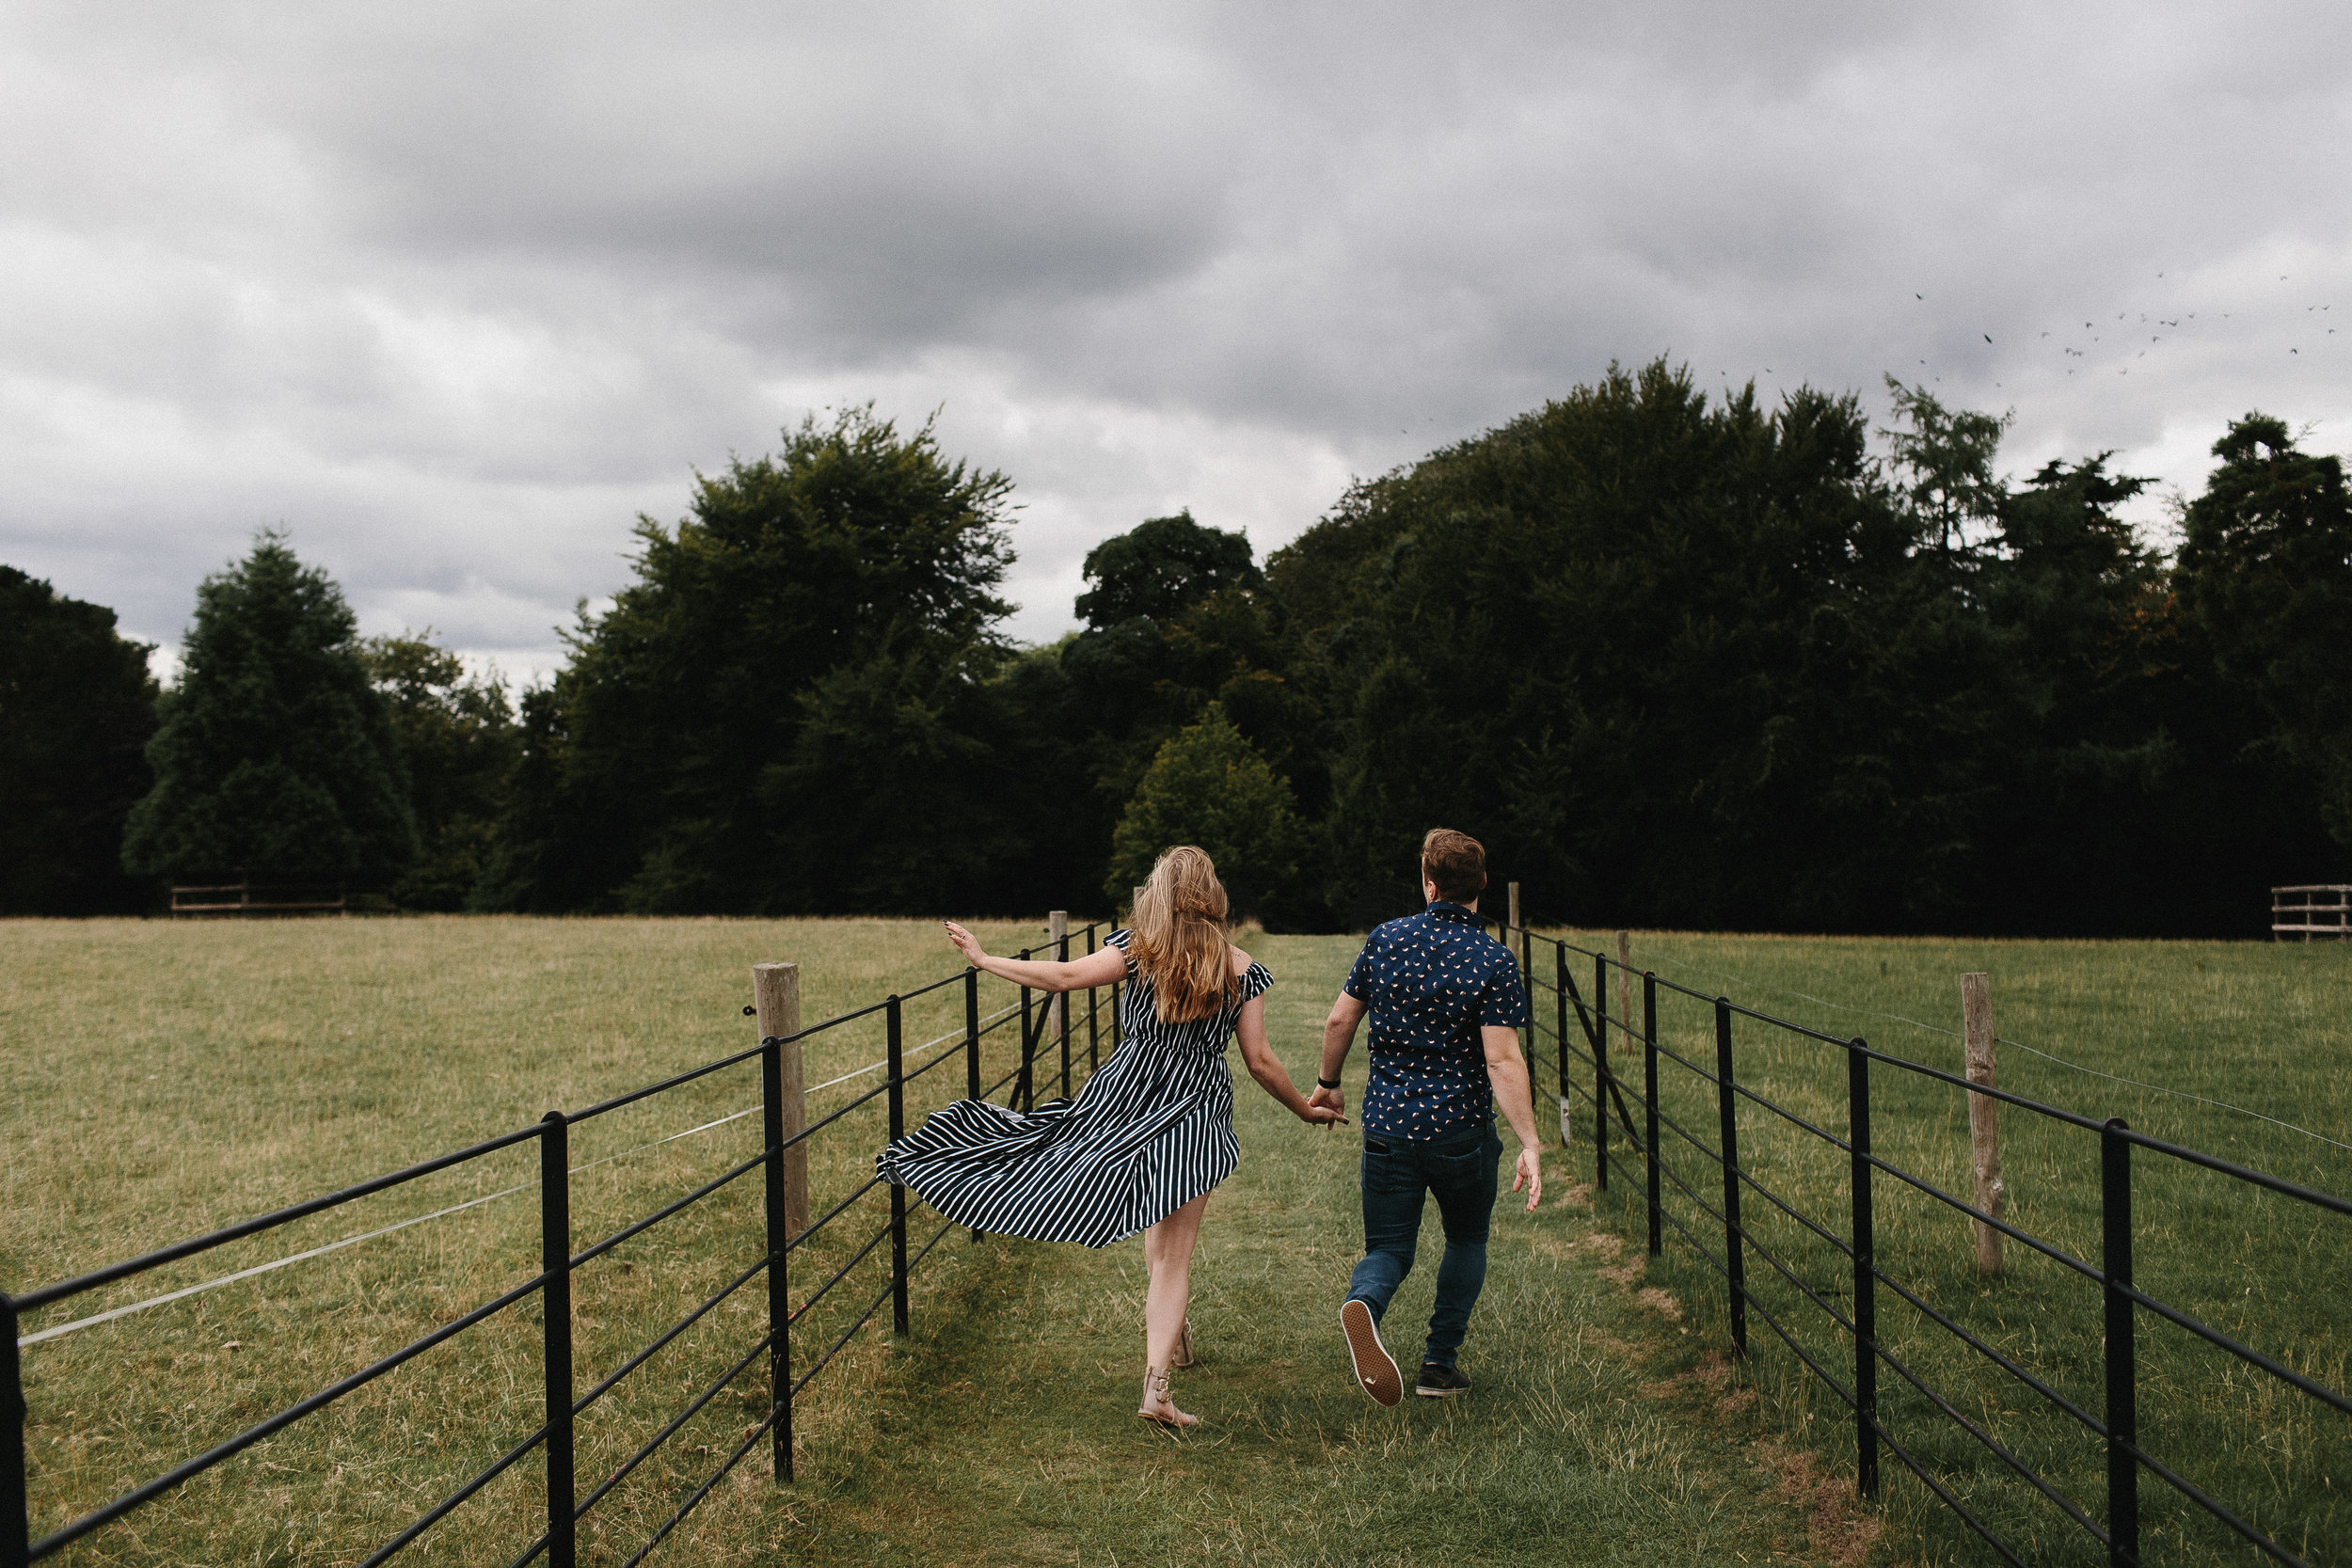 ireland_county_wicklow_glendalough_engagement_adventure_photography_windy_moody_atlanta_wedding_photographer_1037.jpg